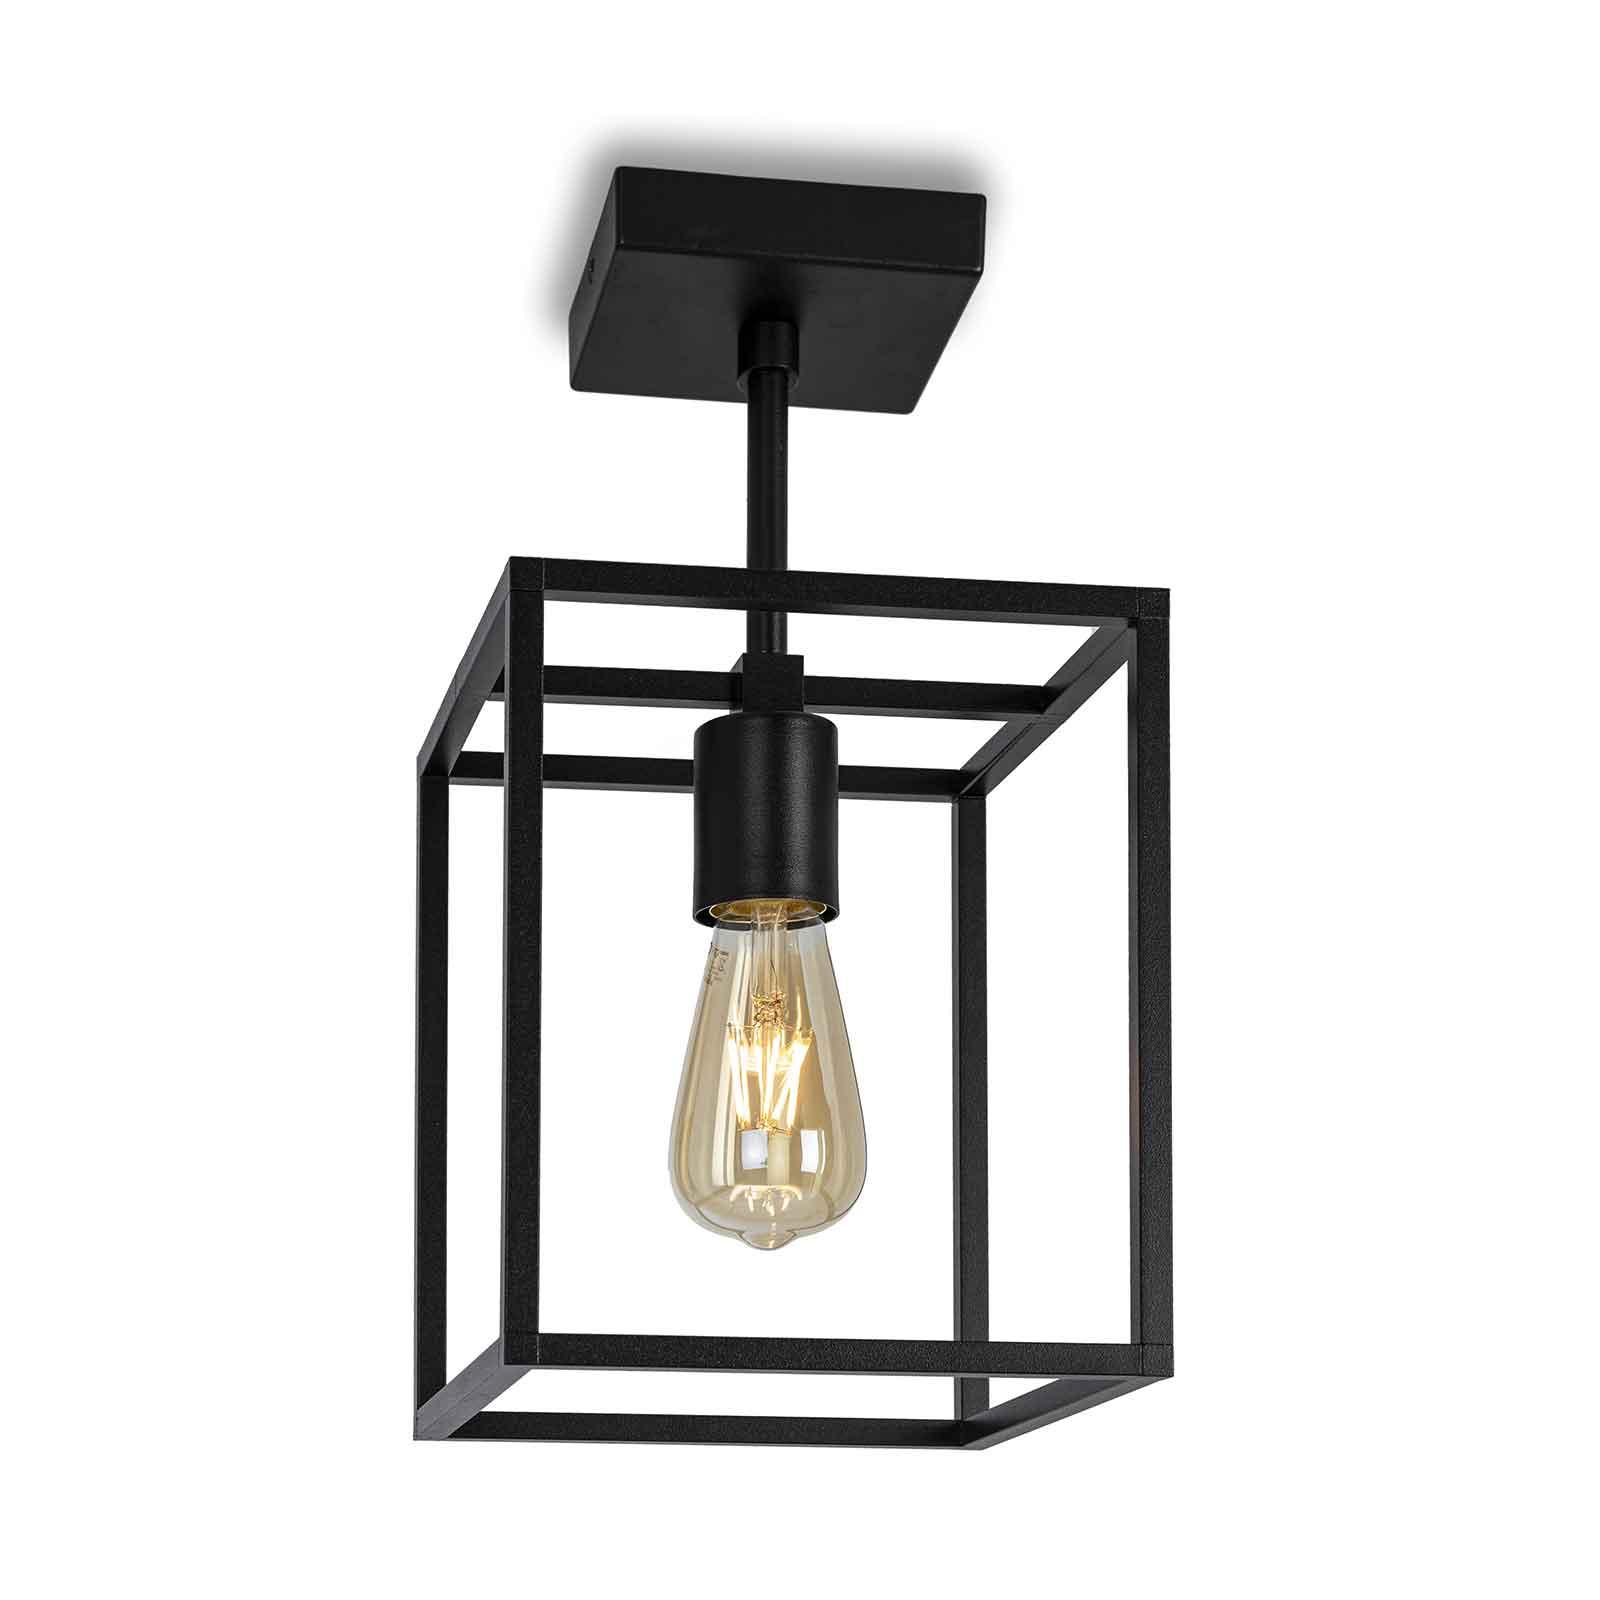 Lampa sufitowa Cubic³ 3394 , czarna